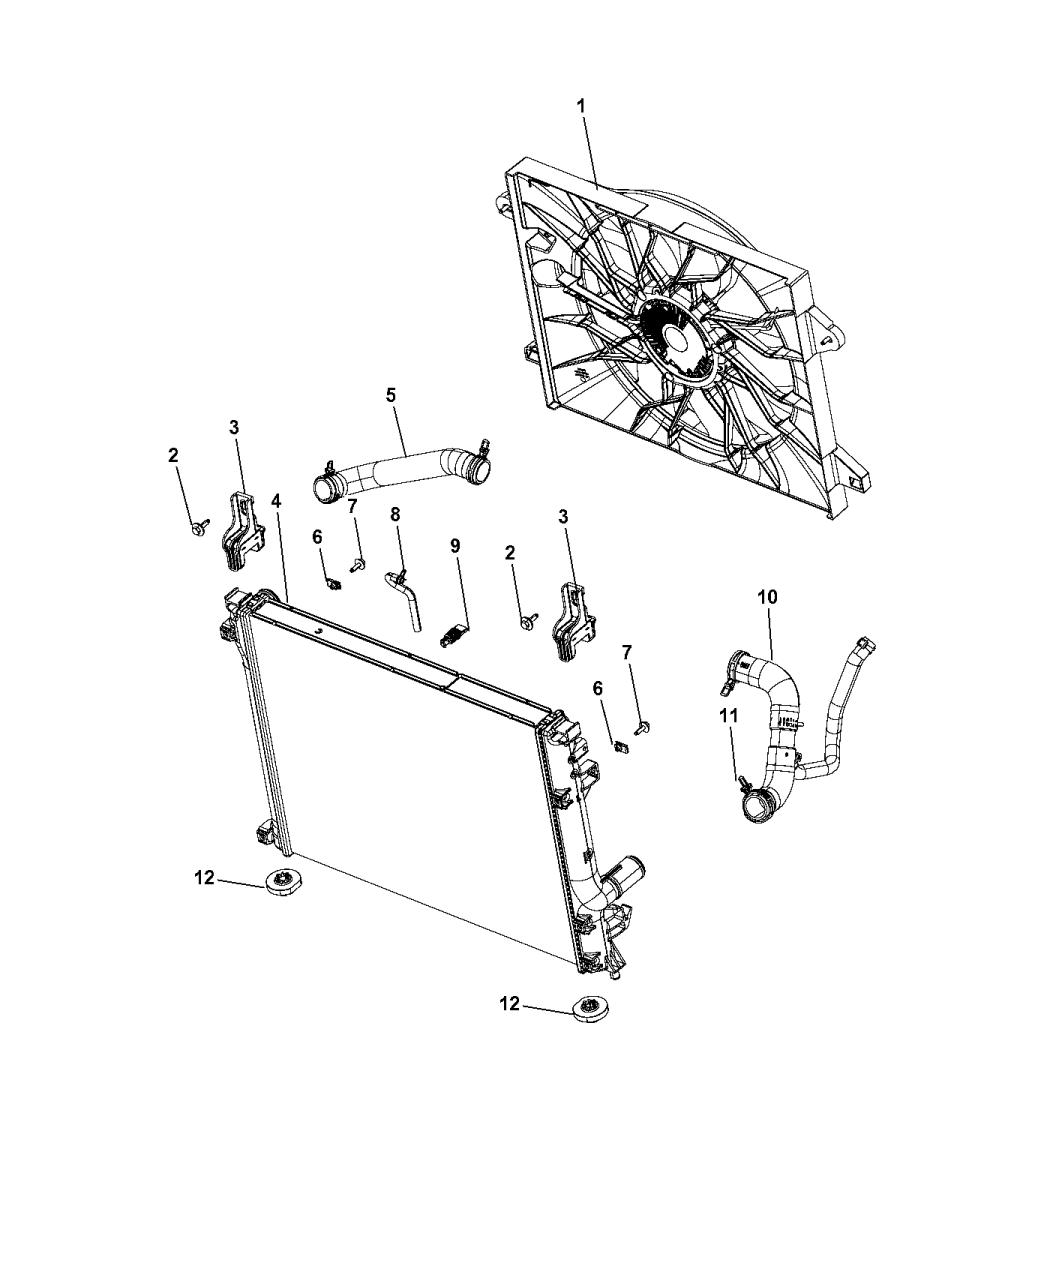 Fine 5181995Ab Genuine Mopar Fanmodule Radiator Cooling Wiring Digital Resources Anistprontobusorg